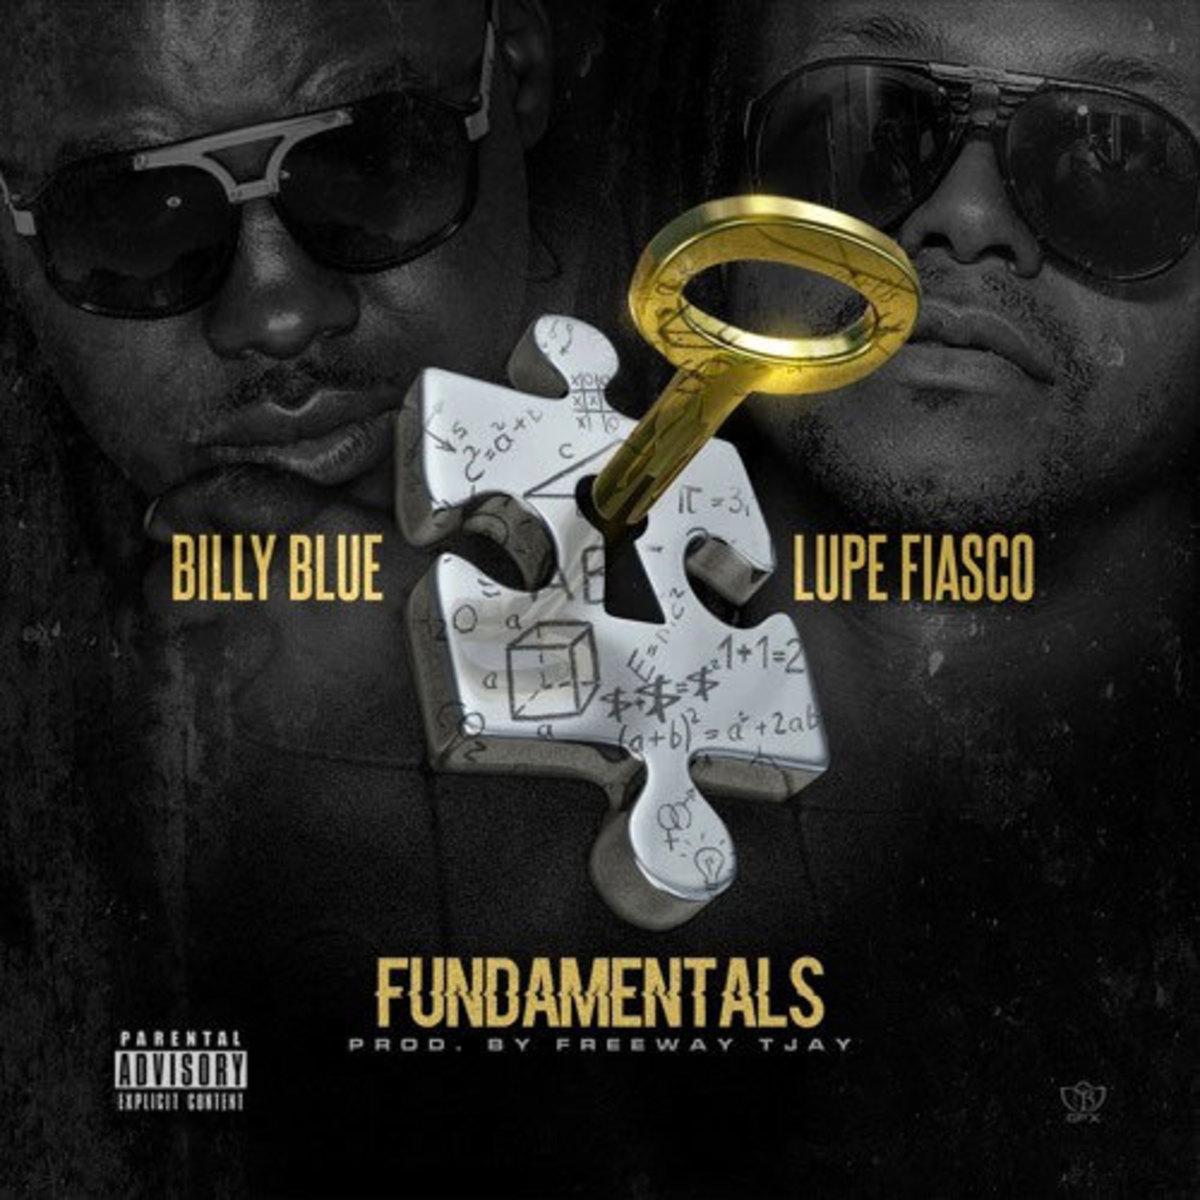 billy-blue-fundamentals.jpg